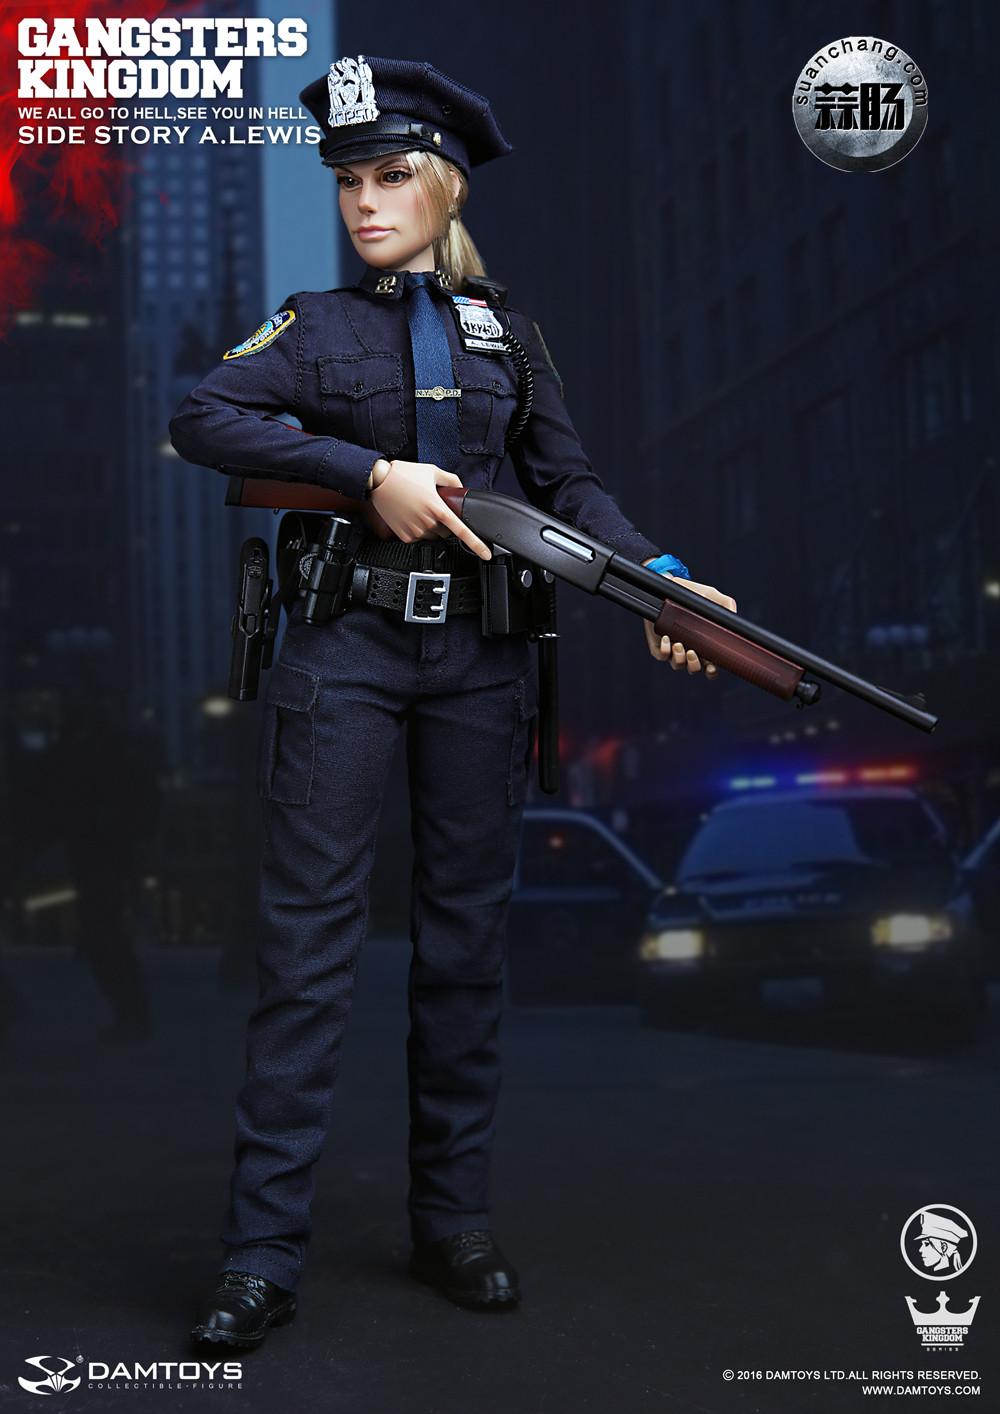 DAMTOYS 1/6黑帮王国系列 番外篇:安妮·刘易斯 警官 模玩 第3张